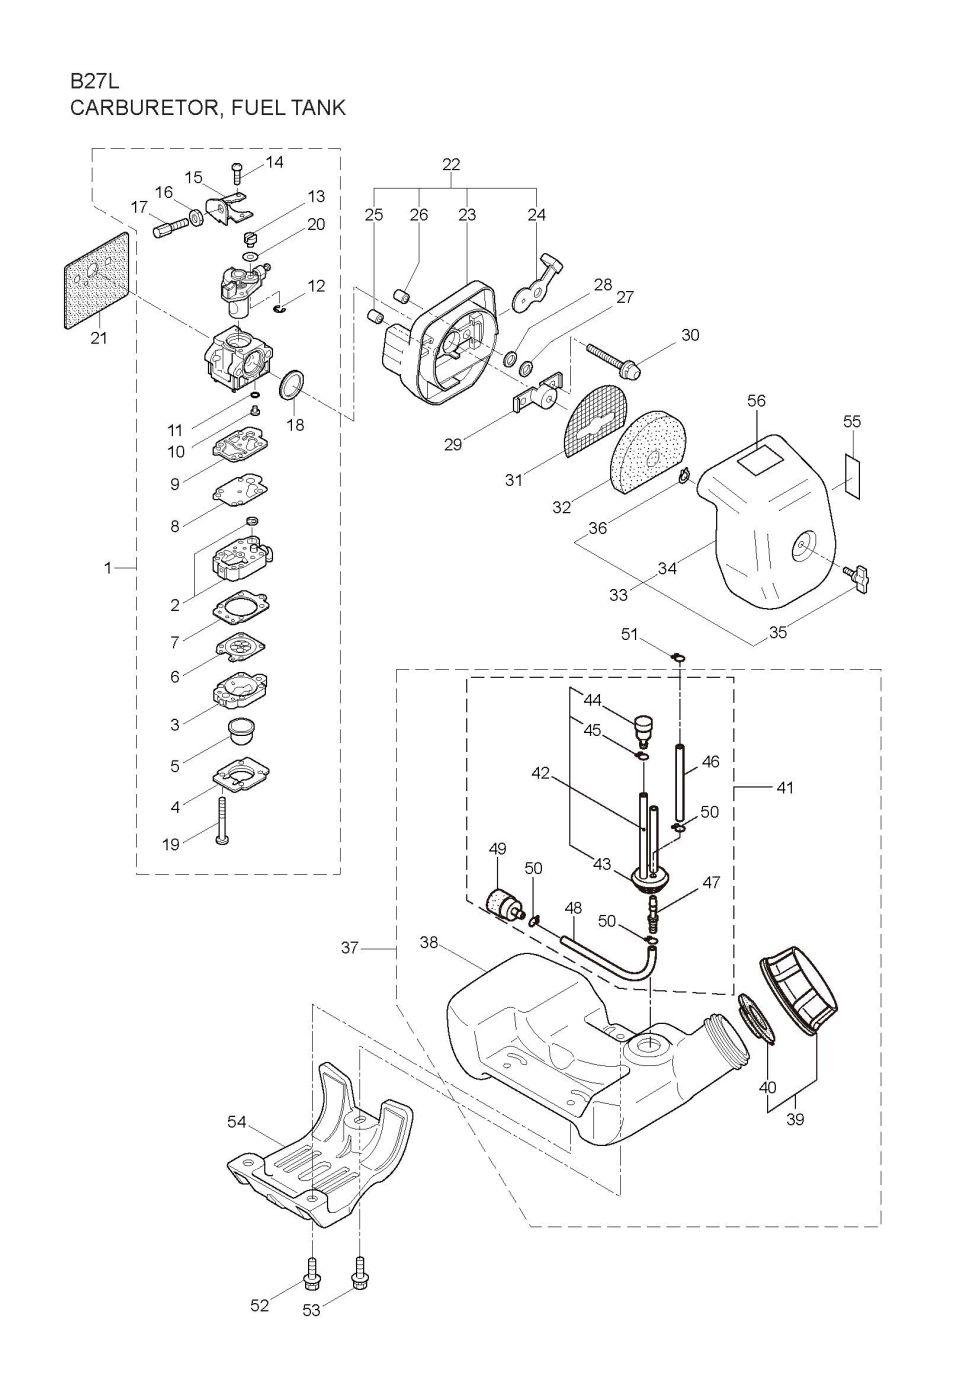 Maruyama Parts Lookup - B27L Parts Diagrams B27L Carburetor